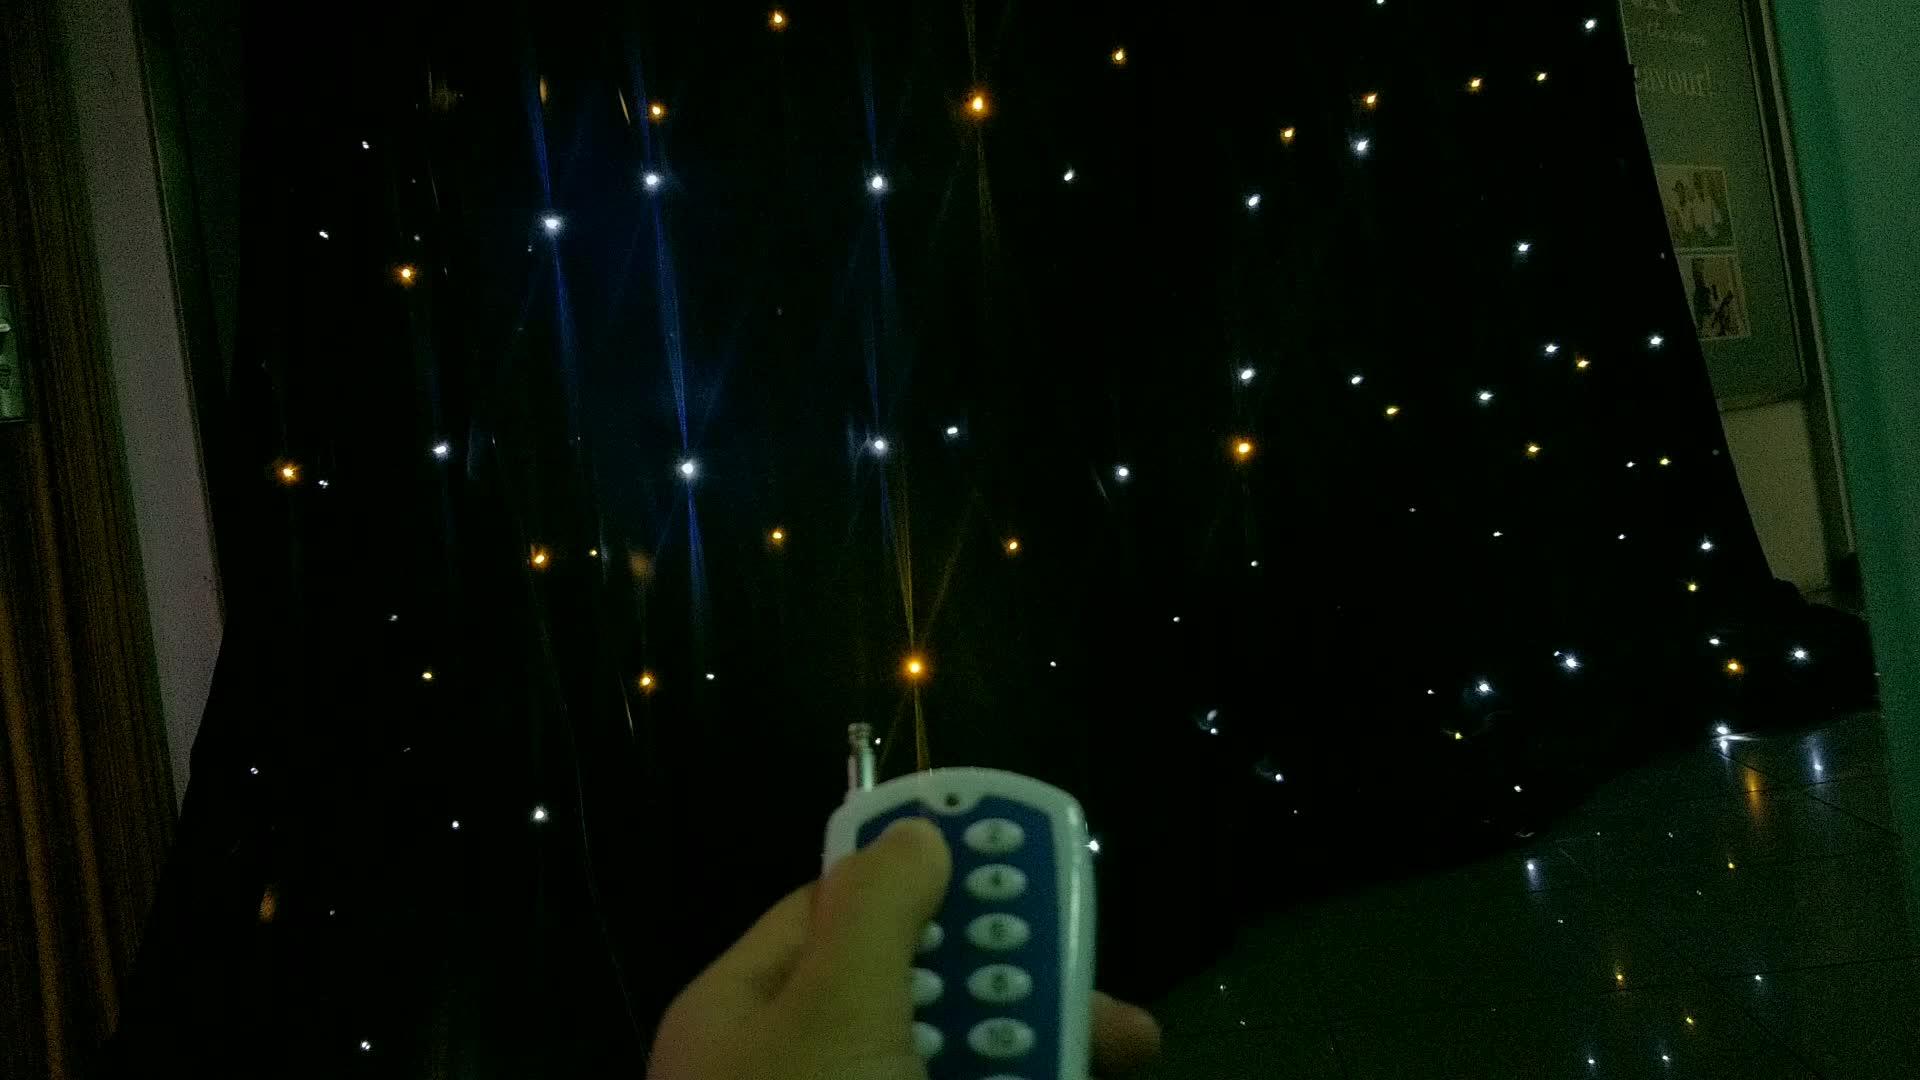 Remote control soft led 빛 matrix 커튼 웨딩 stage 배경으로 대 한 \ % sale